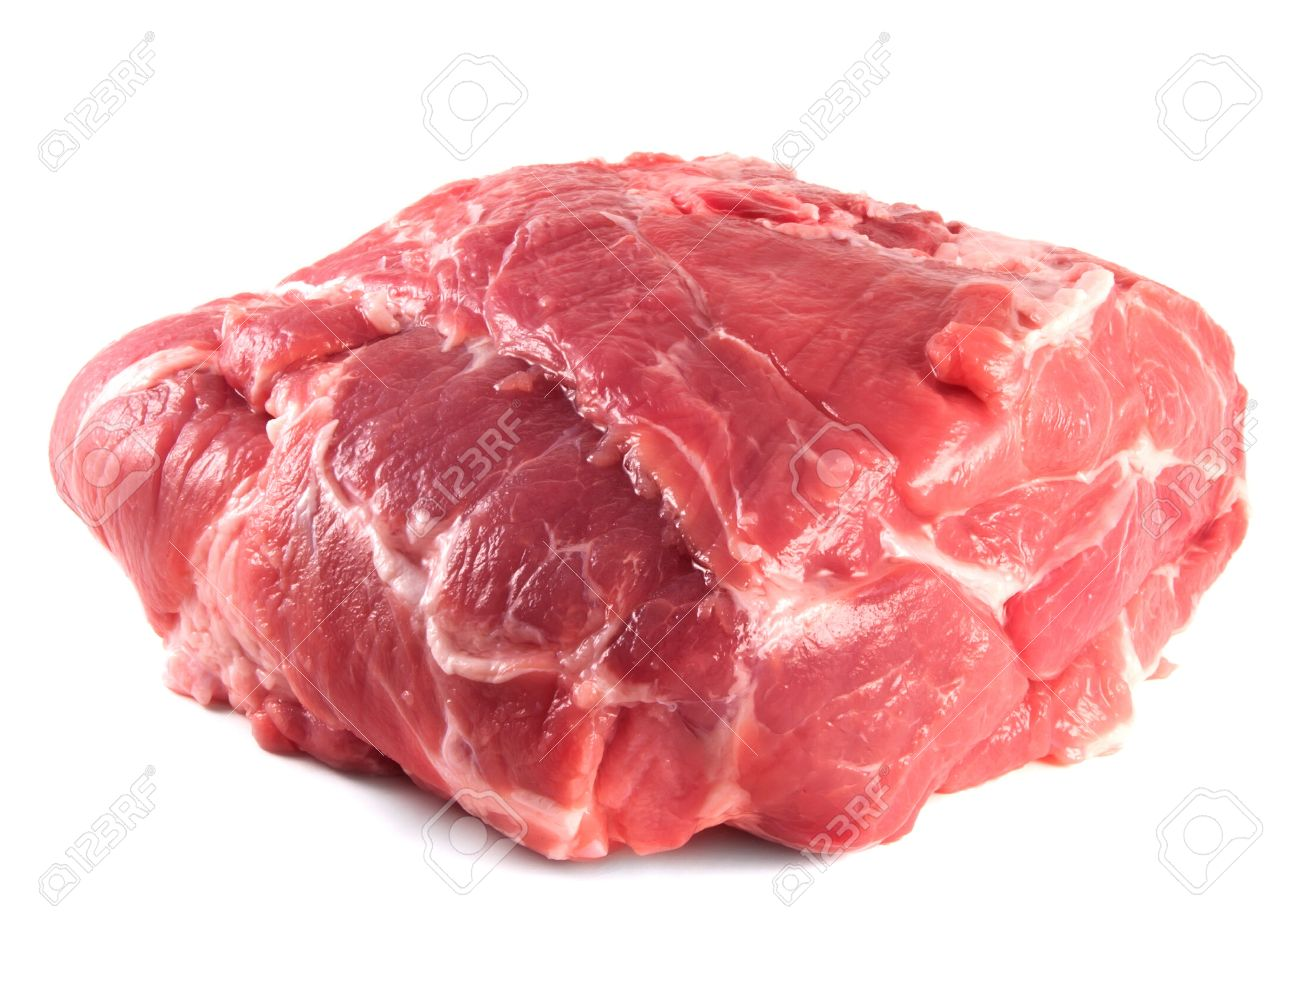 Pork neck carbonade. Fresh raw pork meat. Isolated on white background. Stock Photo - 21906717